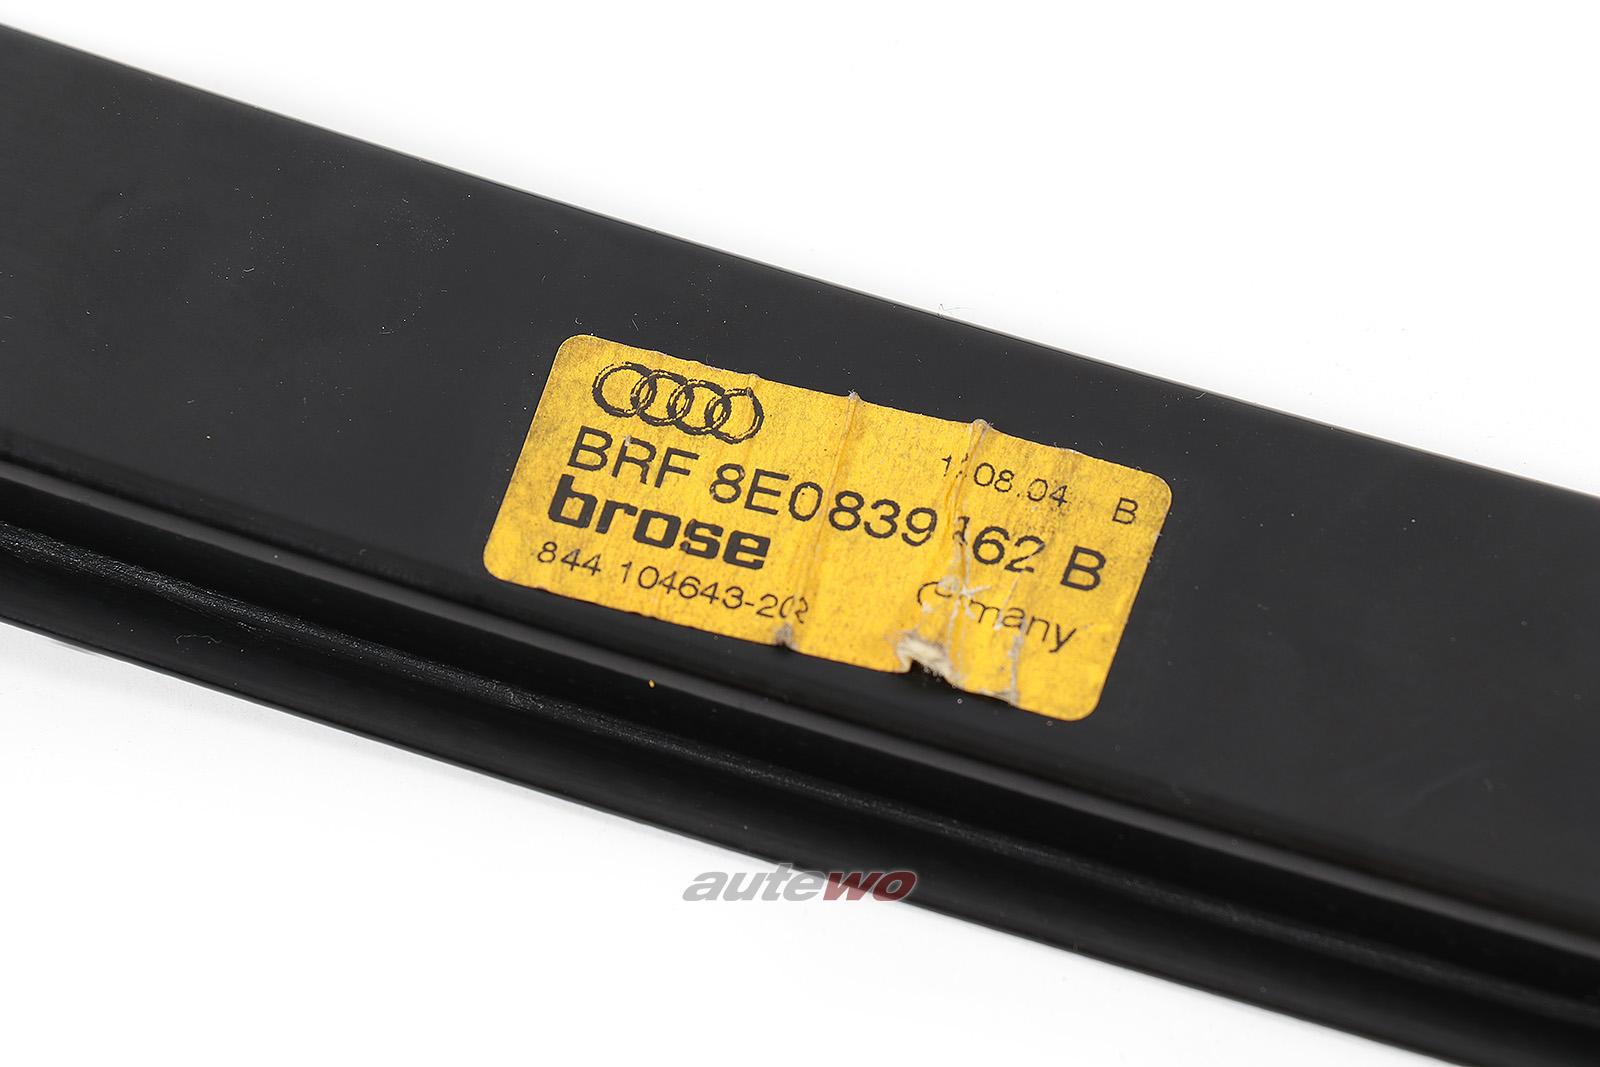 8E0839462C Audi/SEAT A4/S4/RS4 8E/B6/B7/Exeo Fensterheber Hinten Rechts